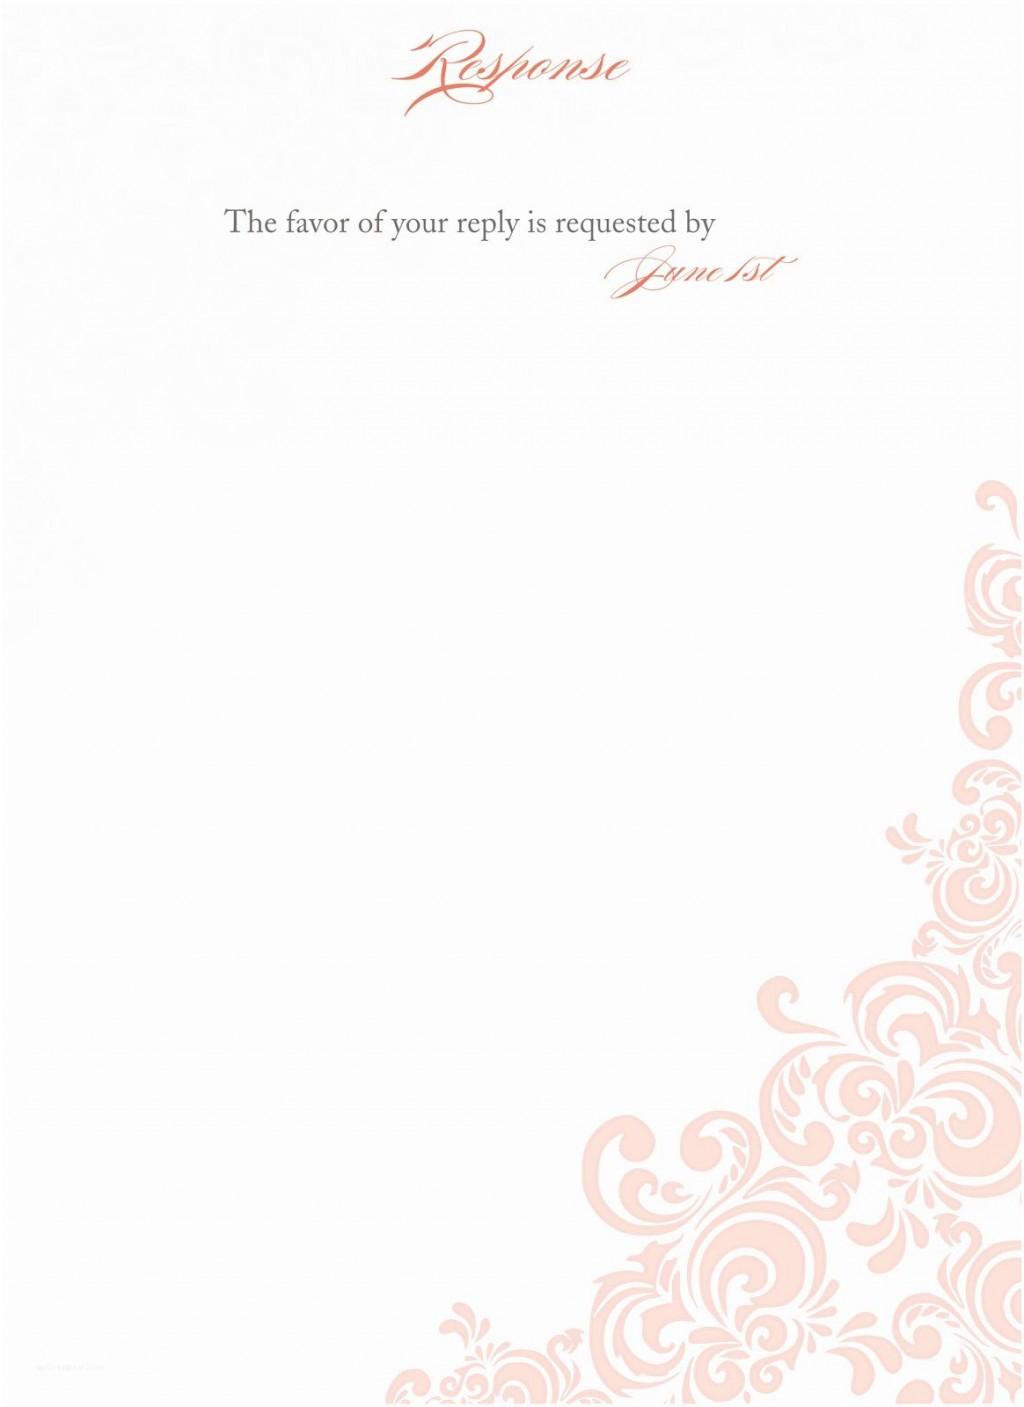 006 Wonderful Blank Wedding Invitation Template Idea  Templates Free Download Printable Royal BlueLarge